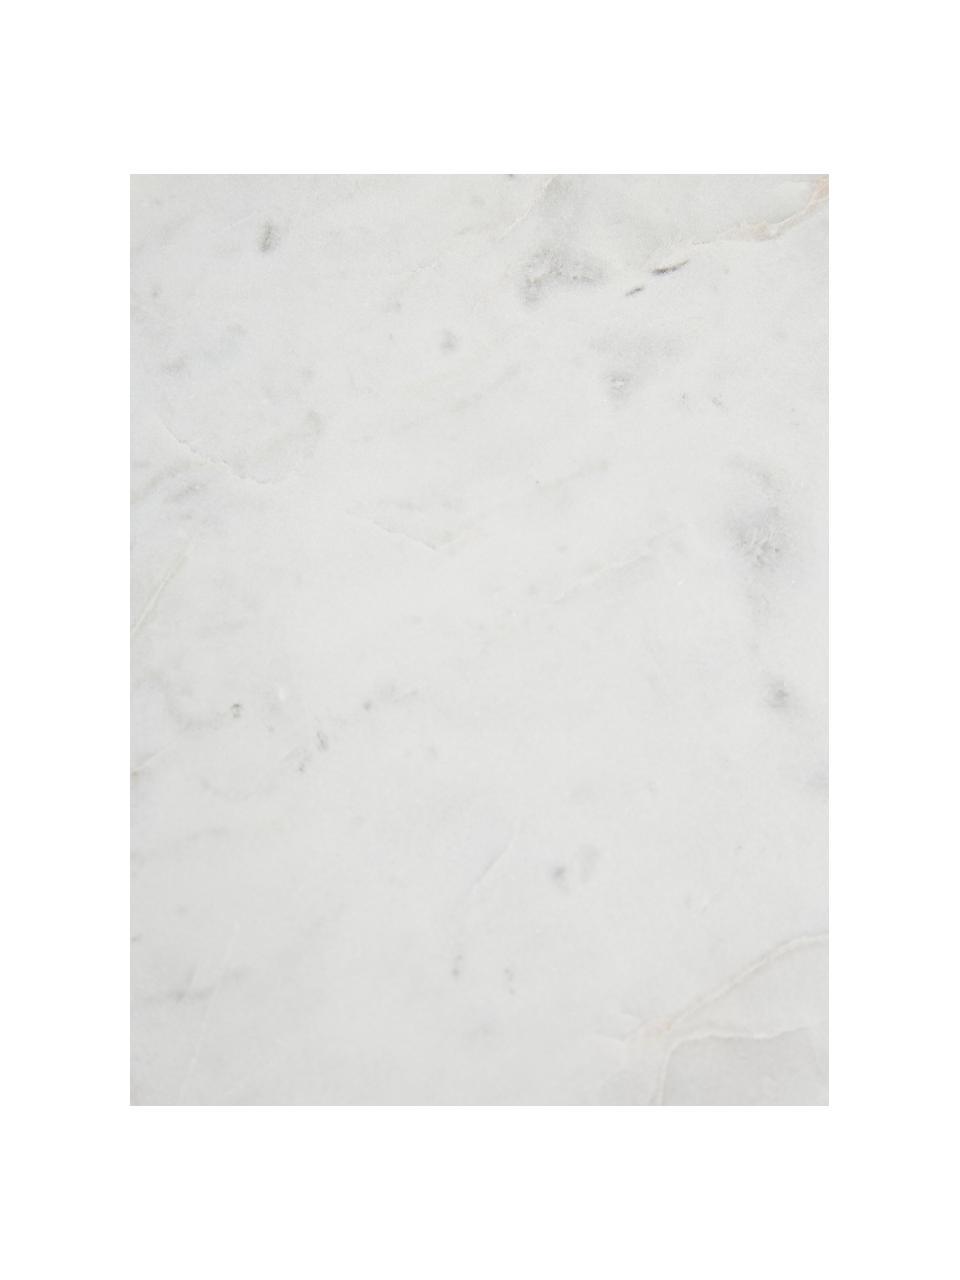 Marmor-Wandregal Porter, Regalboden: Marmor, Weißer Marmor, Goldfarben, 60 x 24 cm